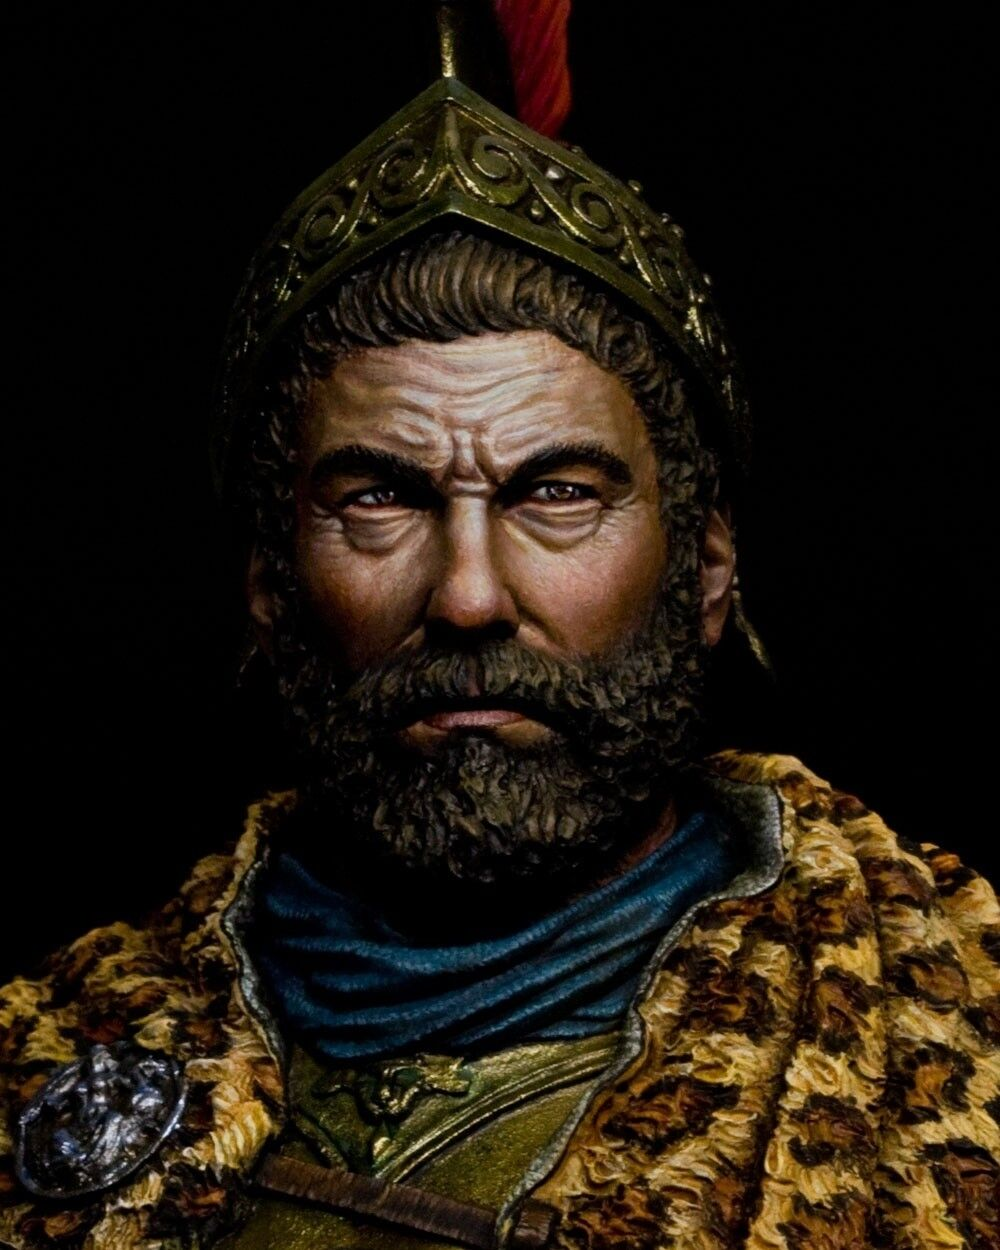 Resin soldier, museum, bust,Hannibal Barca, Carthaginian general, Punic War,1 10